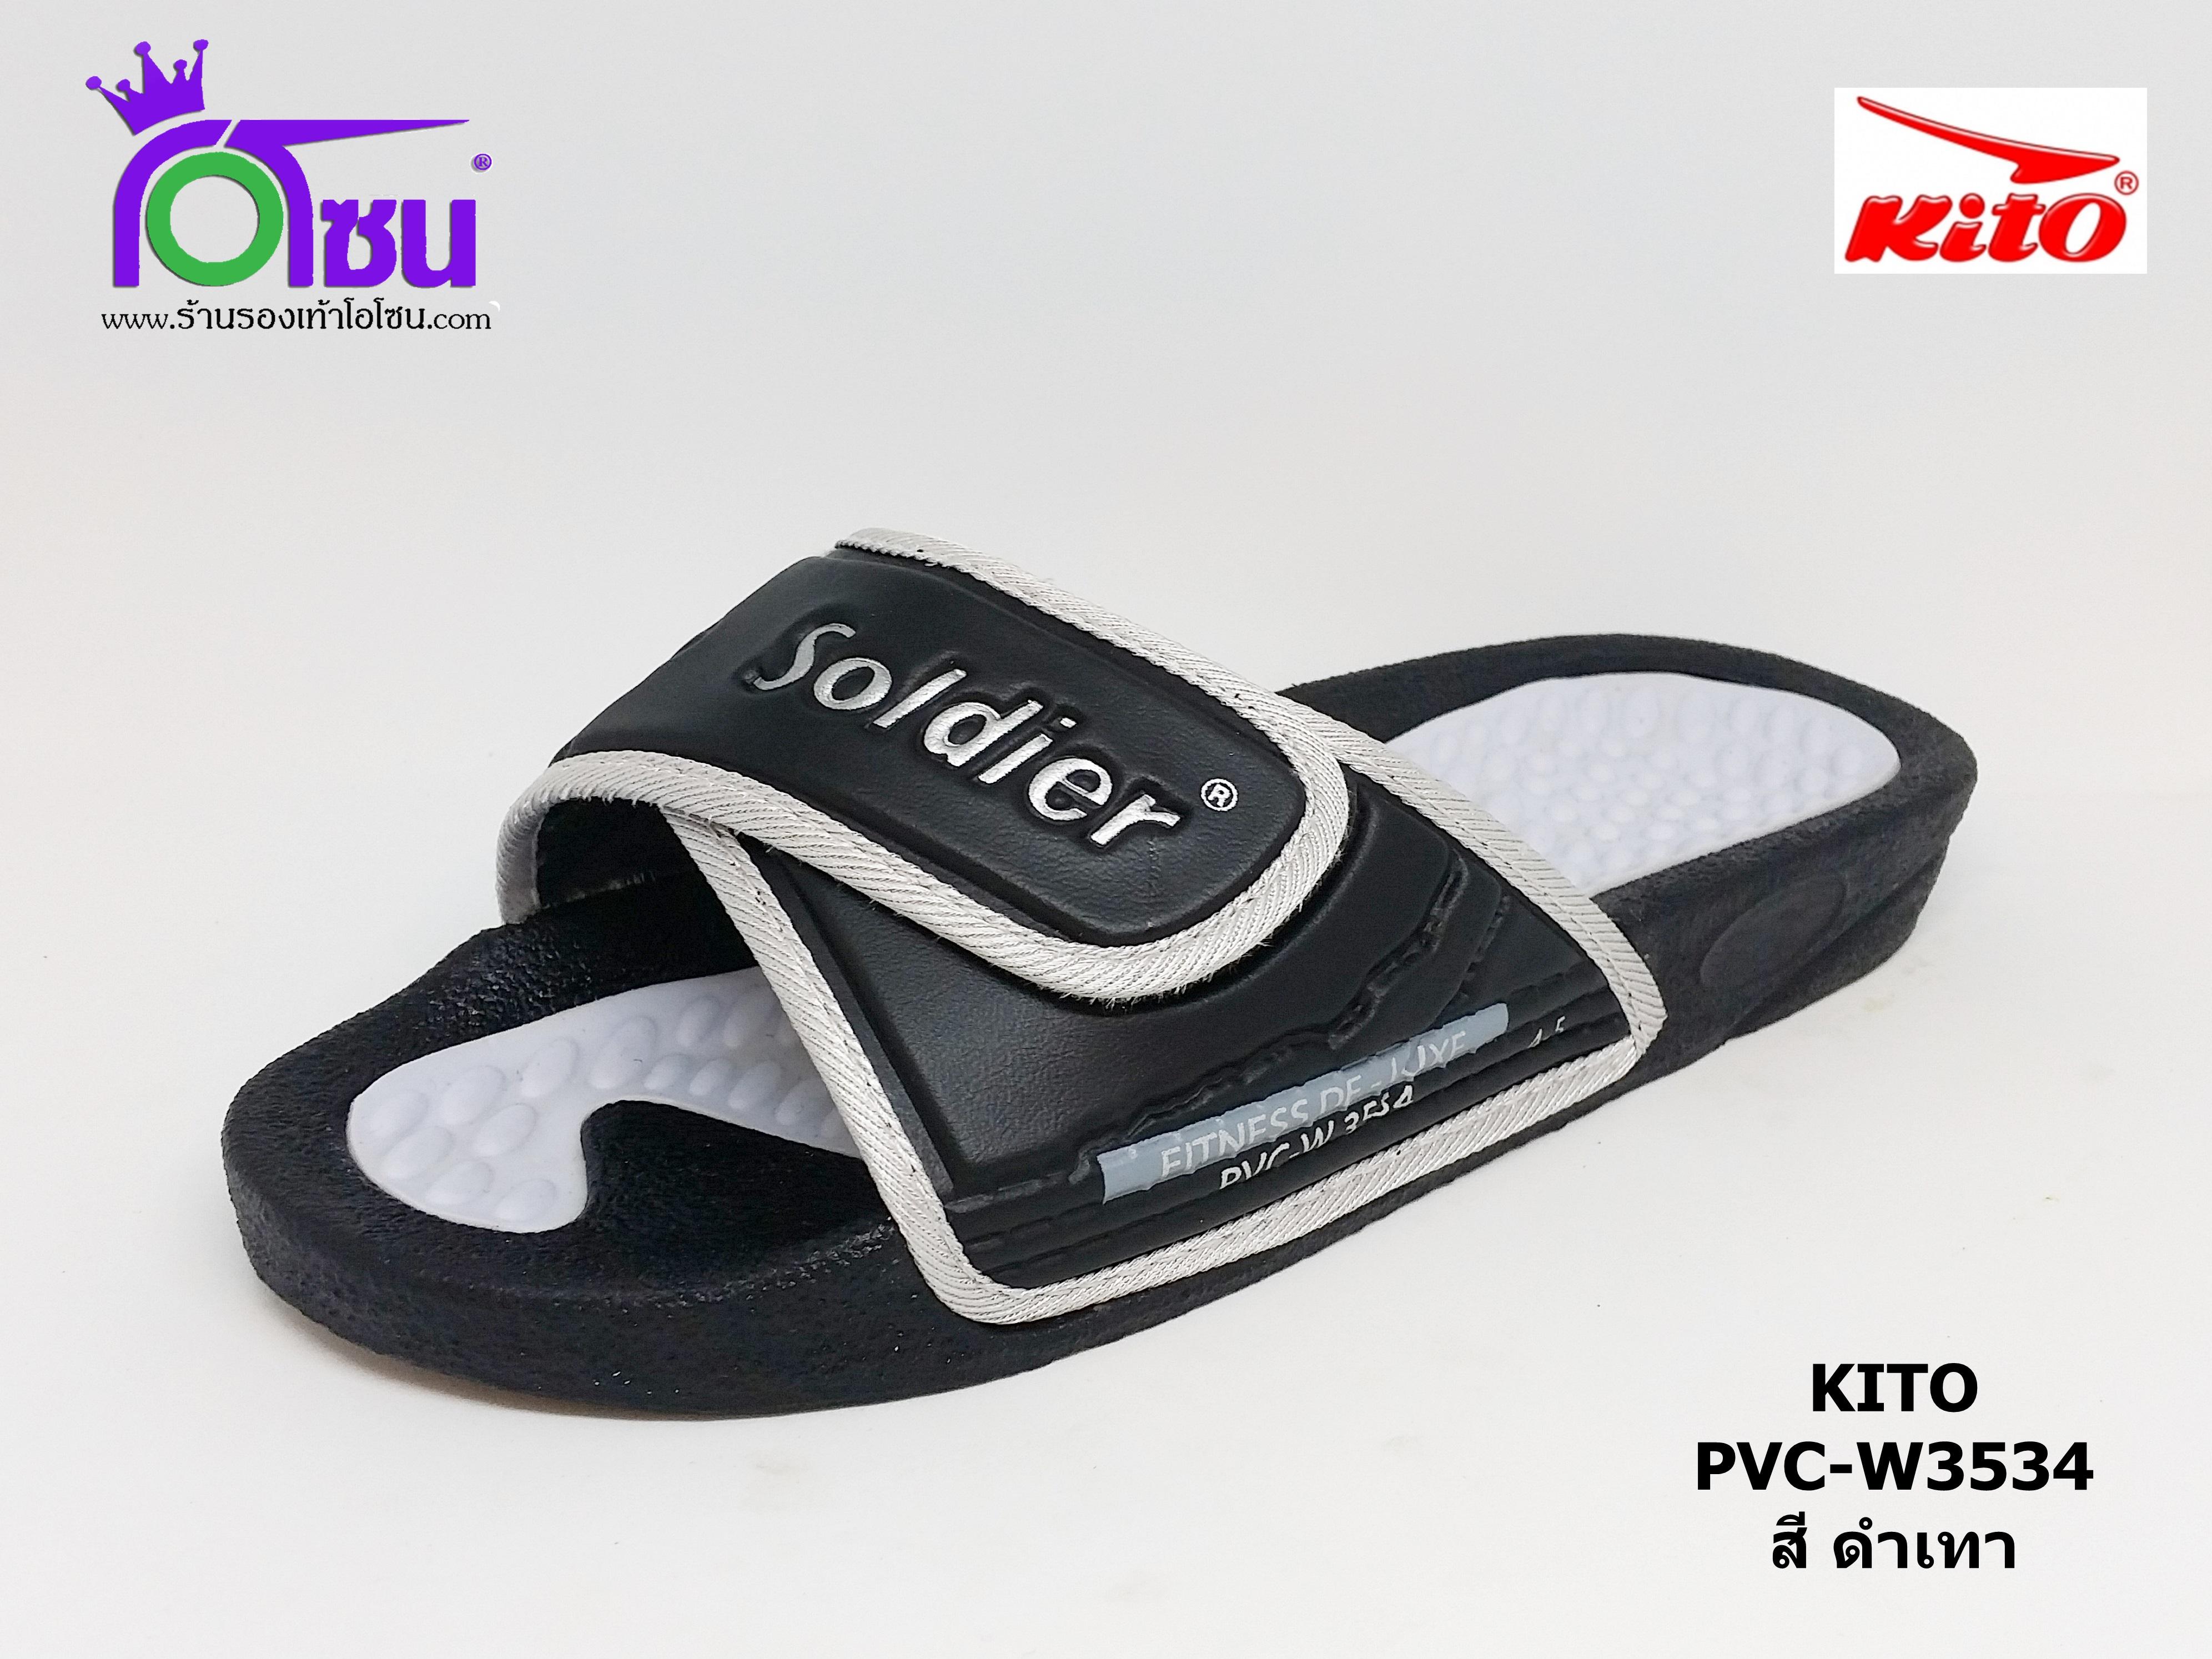 KITO Fitness Deluxe กีโต้ ฟิตเนส เดอลุกซ์ รหัส PVC-W3534 สีดำเทา เบอร์ 4-8 สำเนา